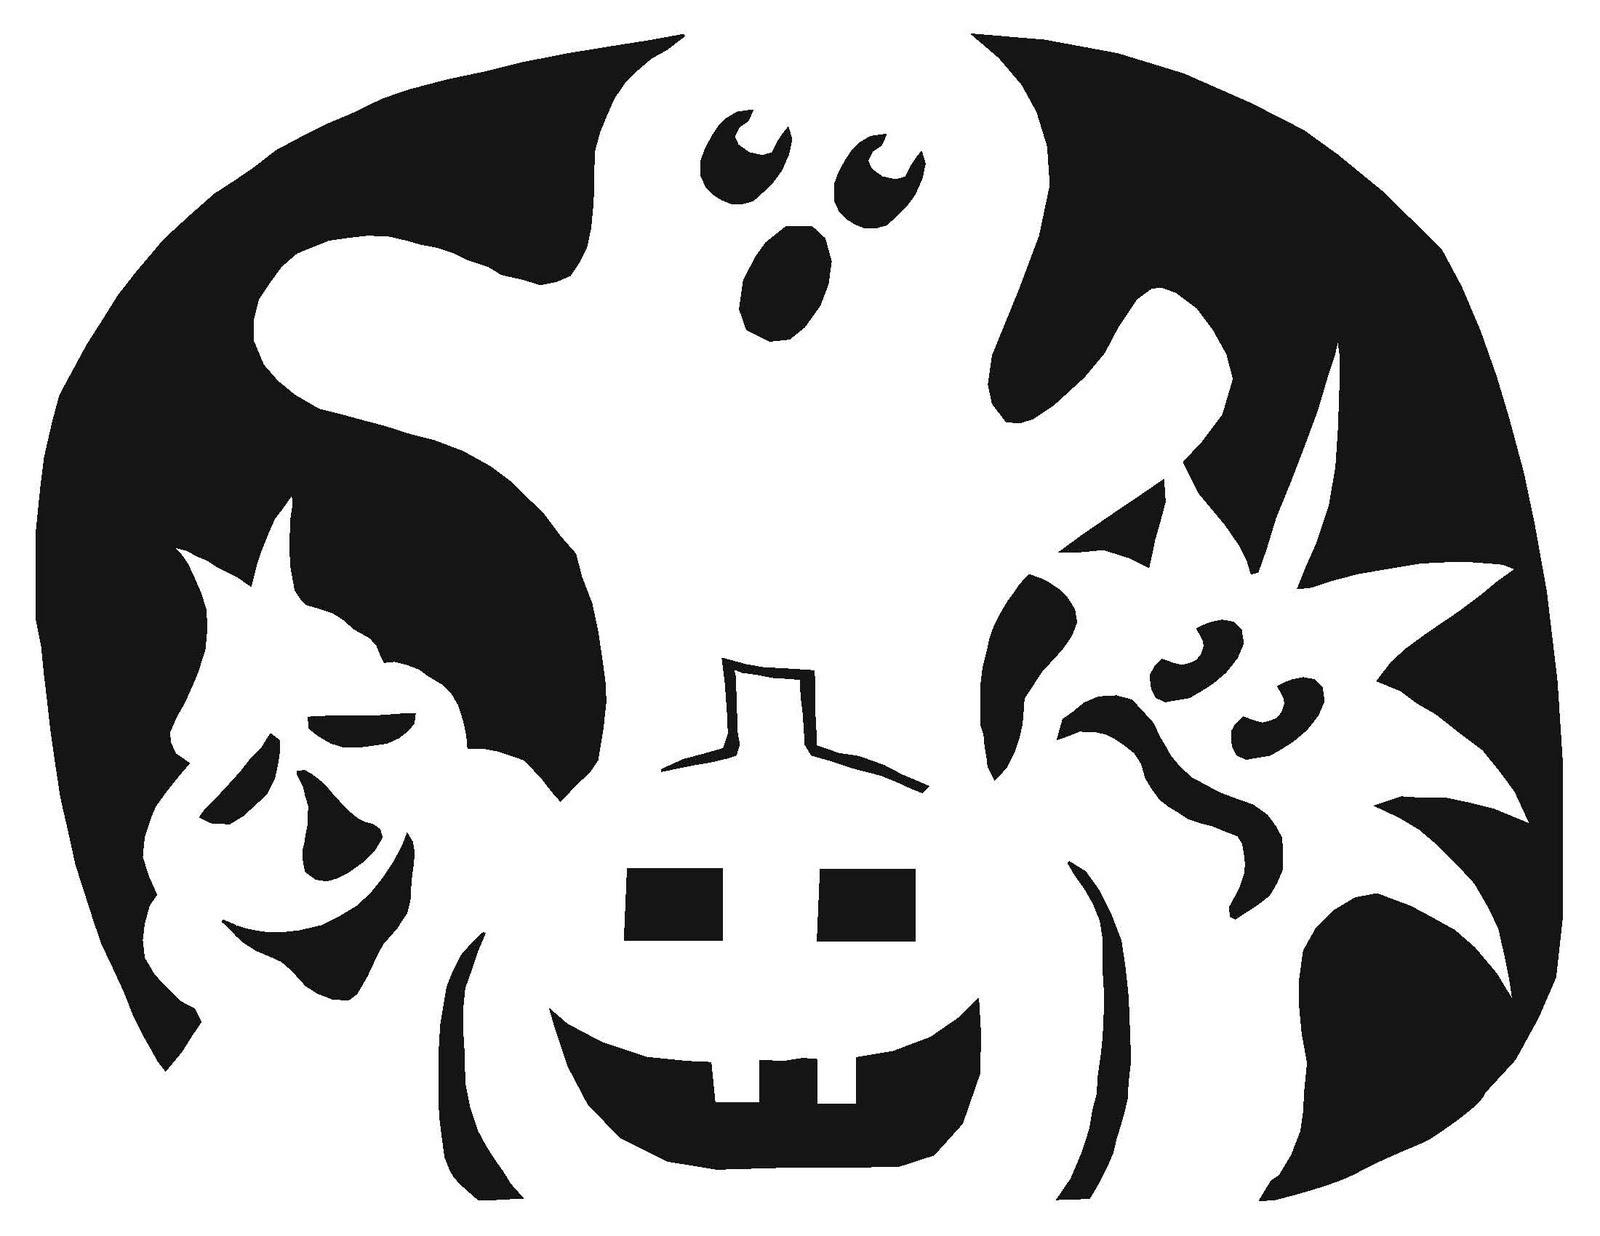 Free Guitar Pumpkin Stencil, Download Free Clip Art, Free Clip Art - Free Printable Pumpkin Patterns